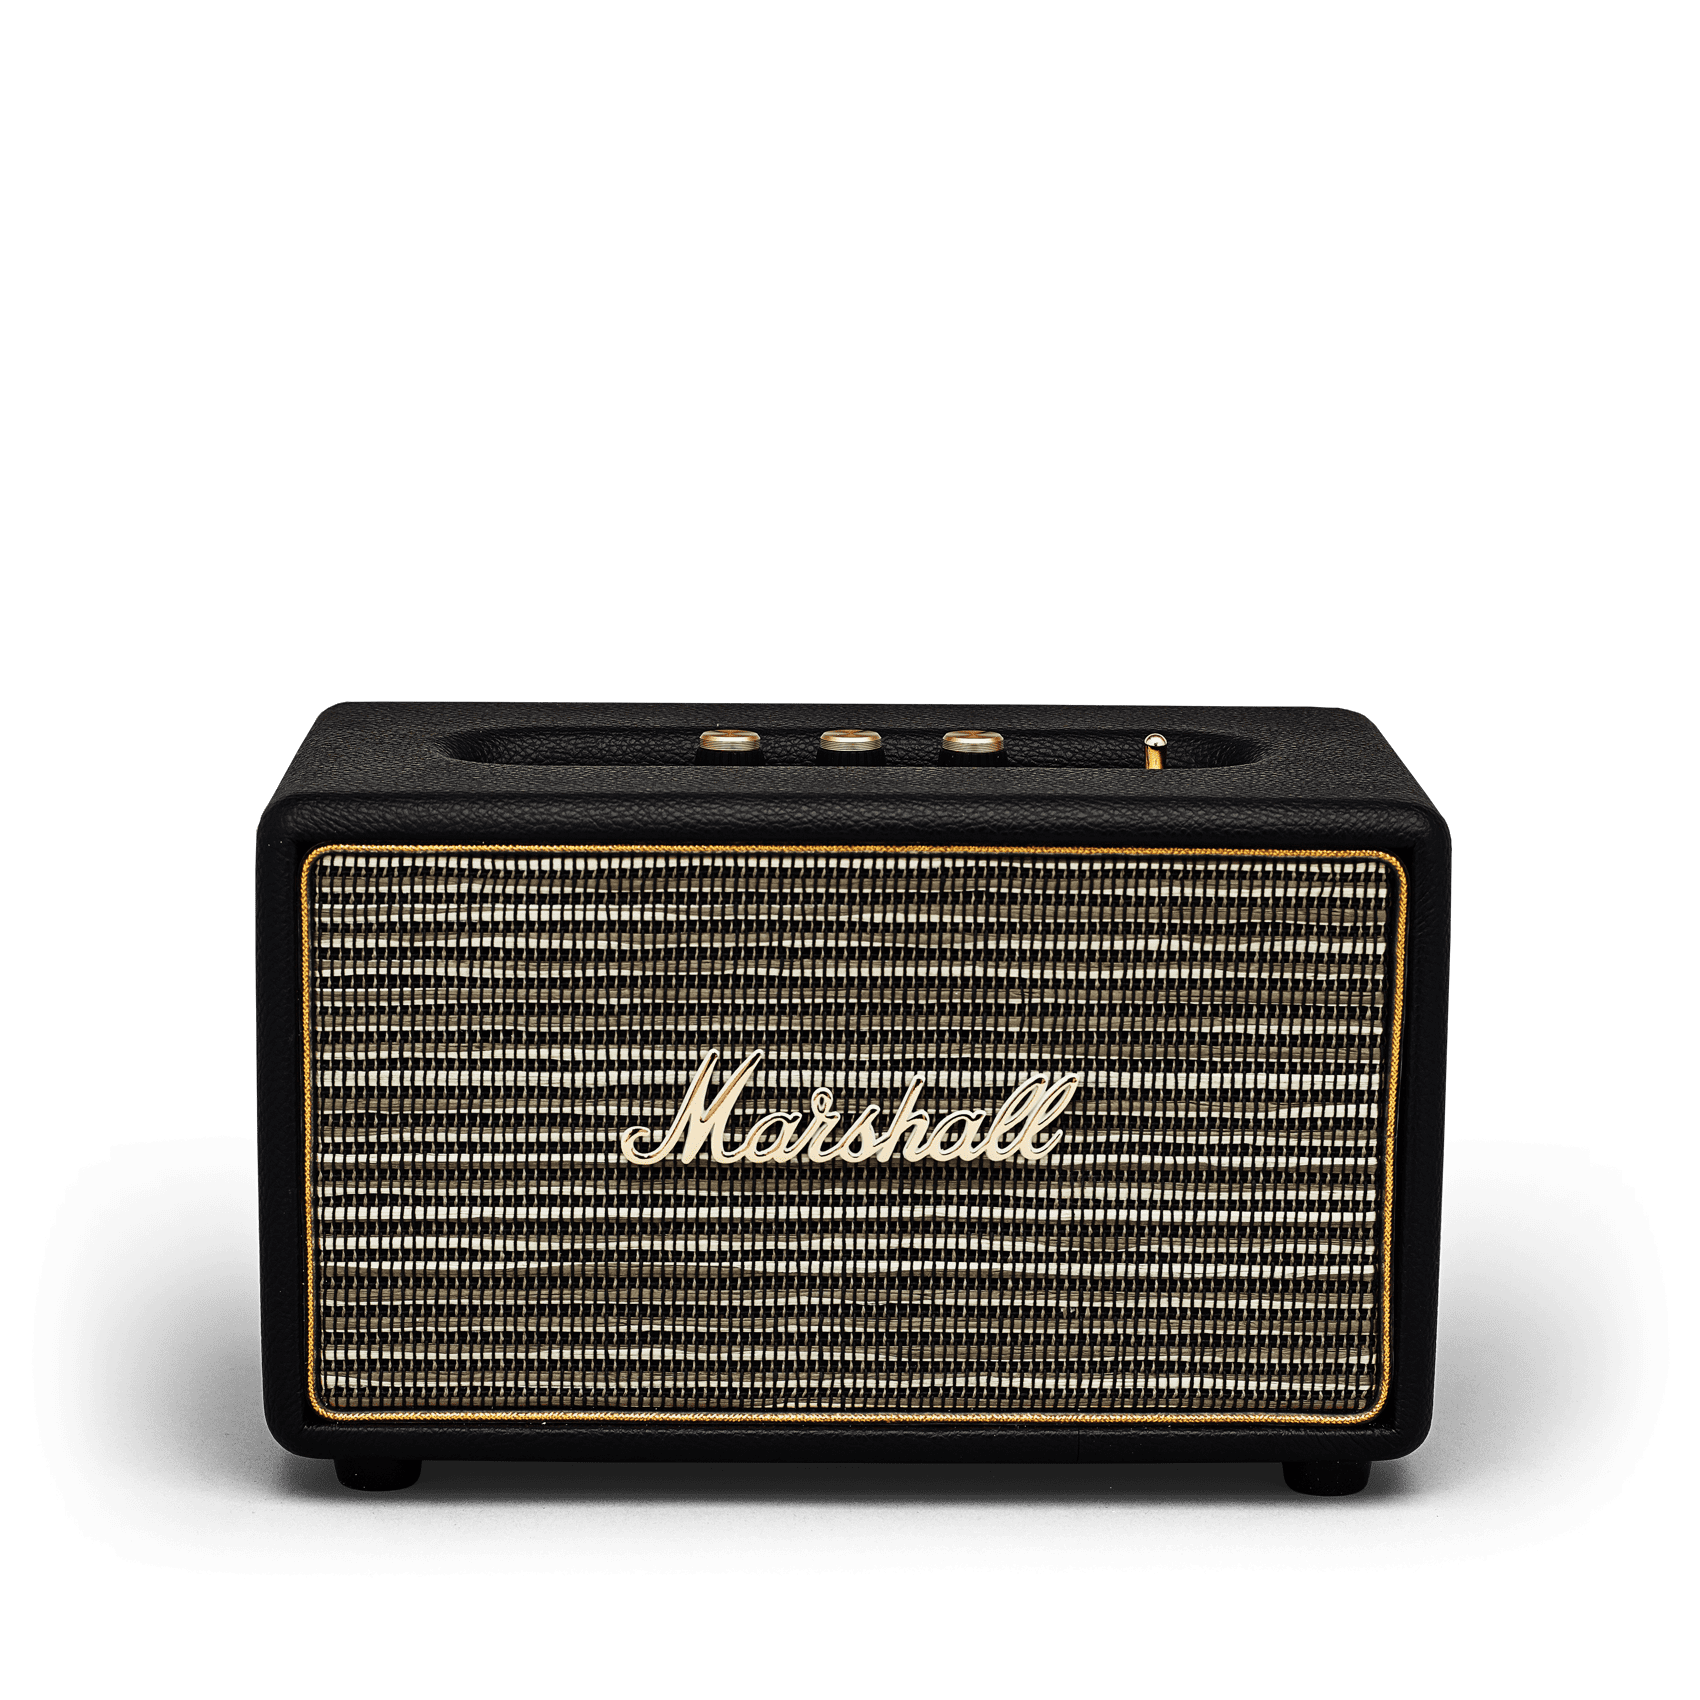 7a222a9b475 Acton - Bluetooth Wireless Speaker | Marshall